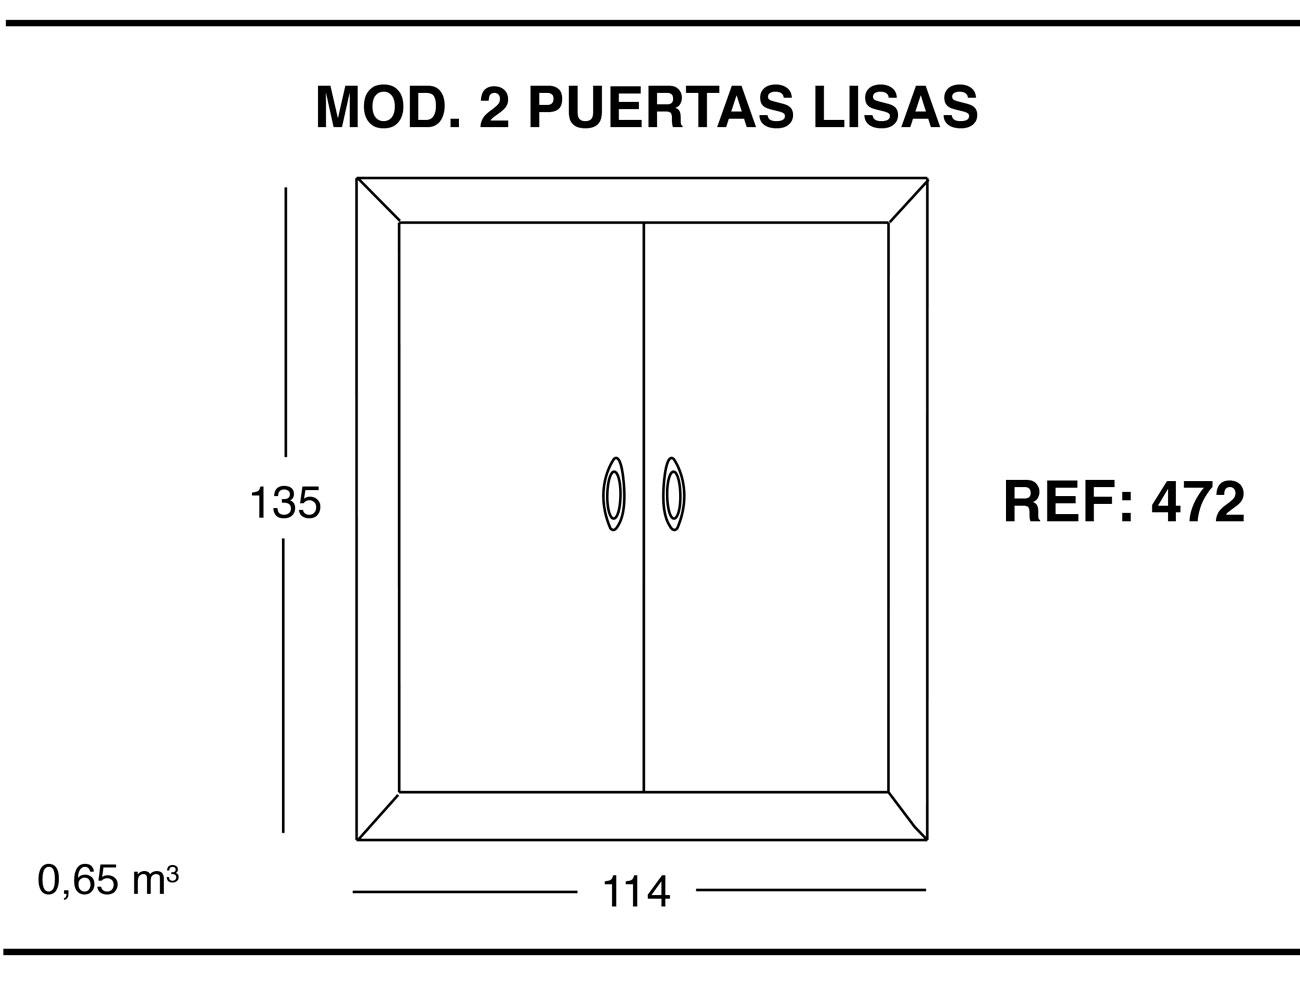 Modulo 2 puertas lisas 135 114